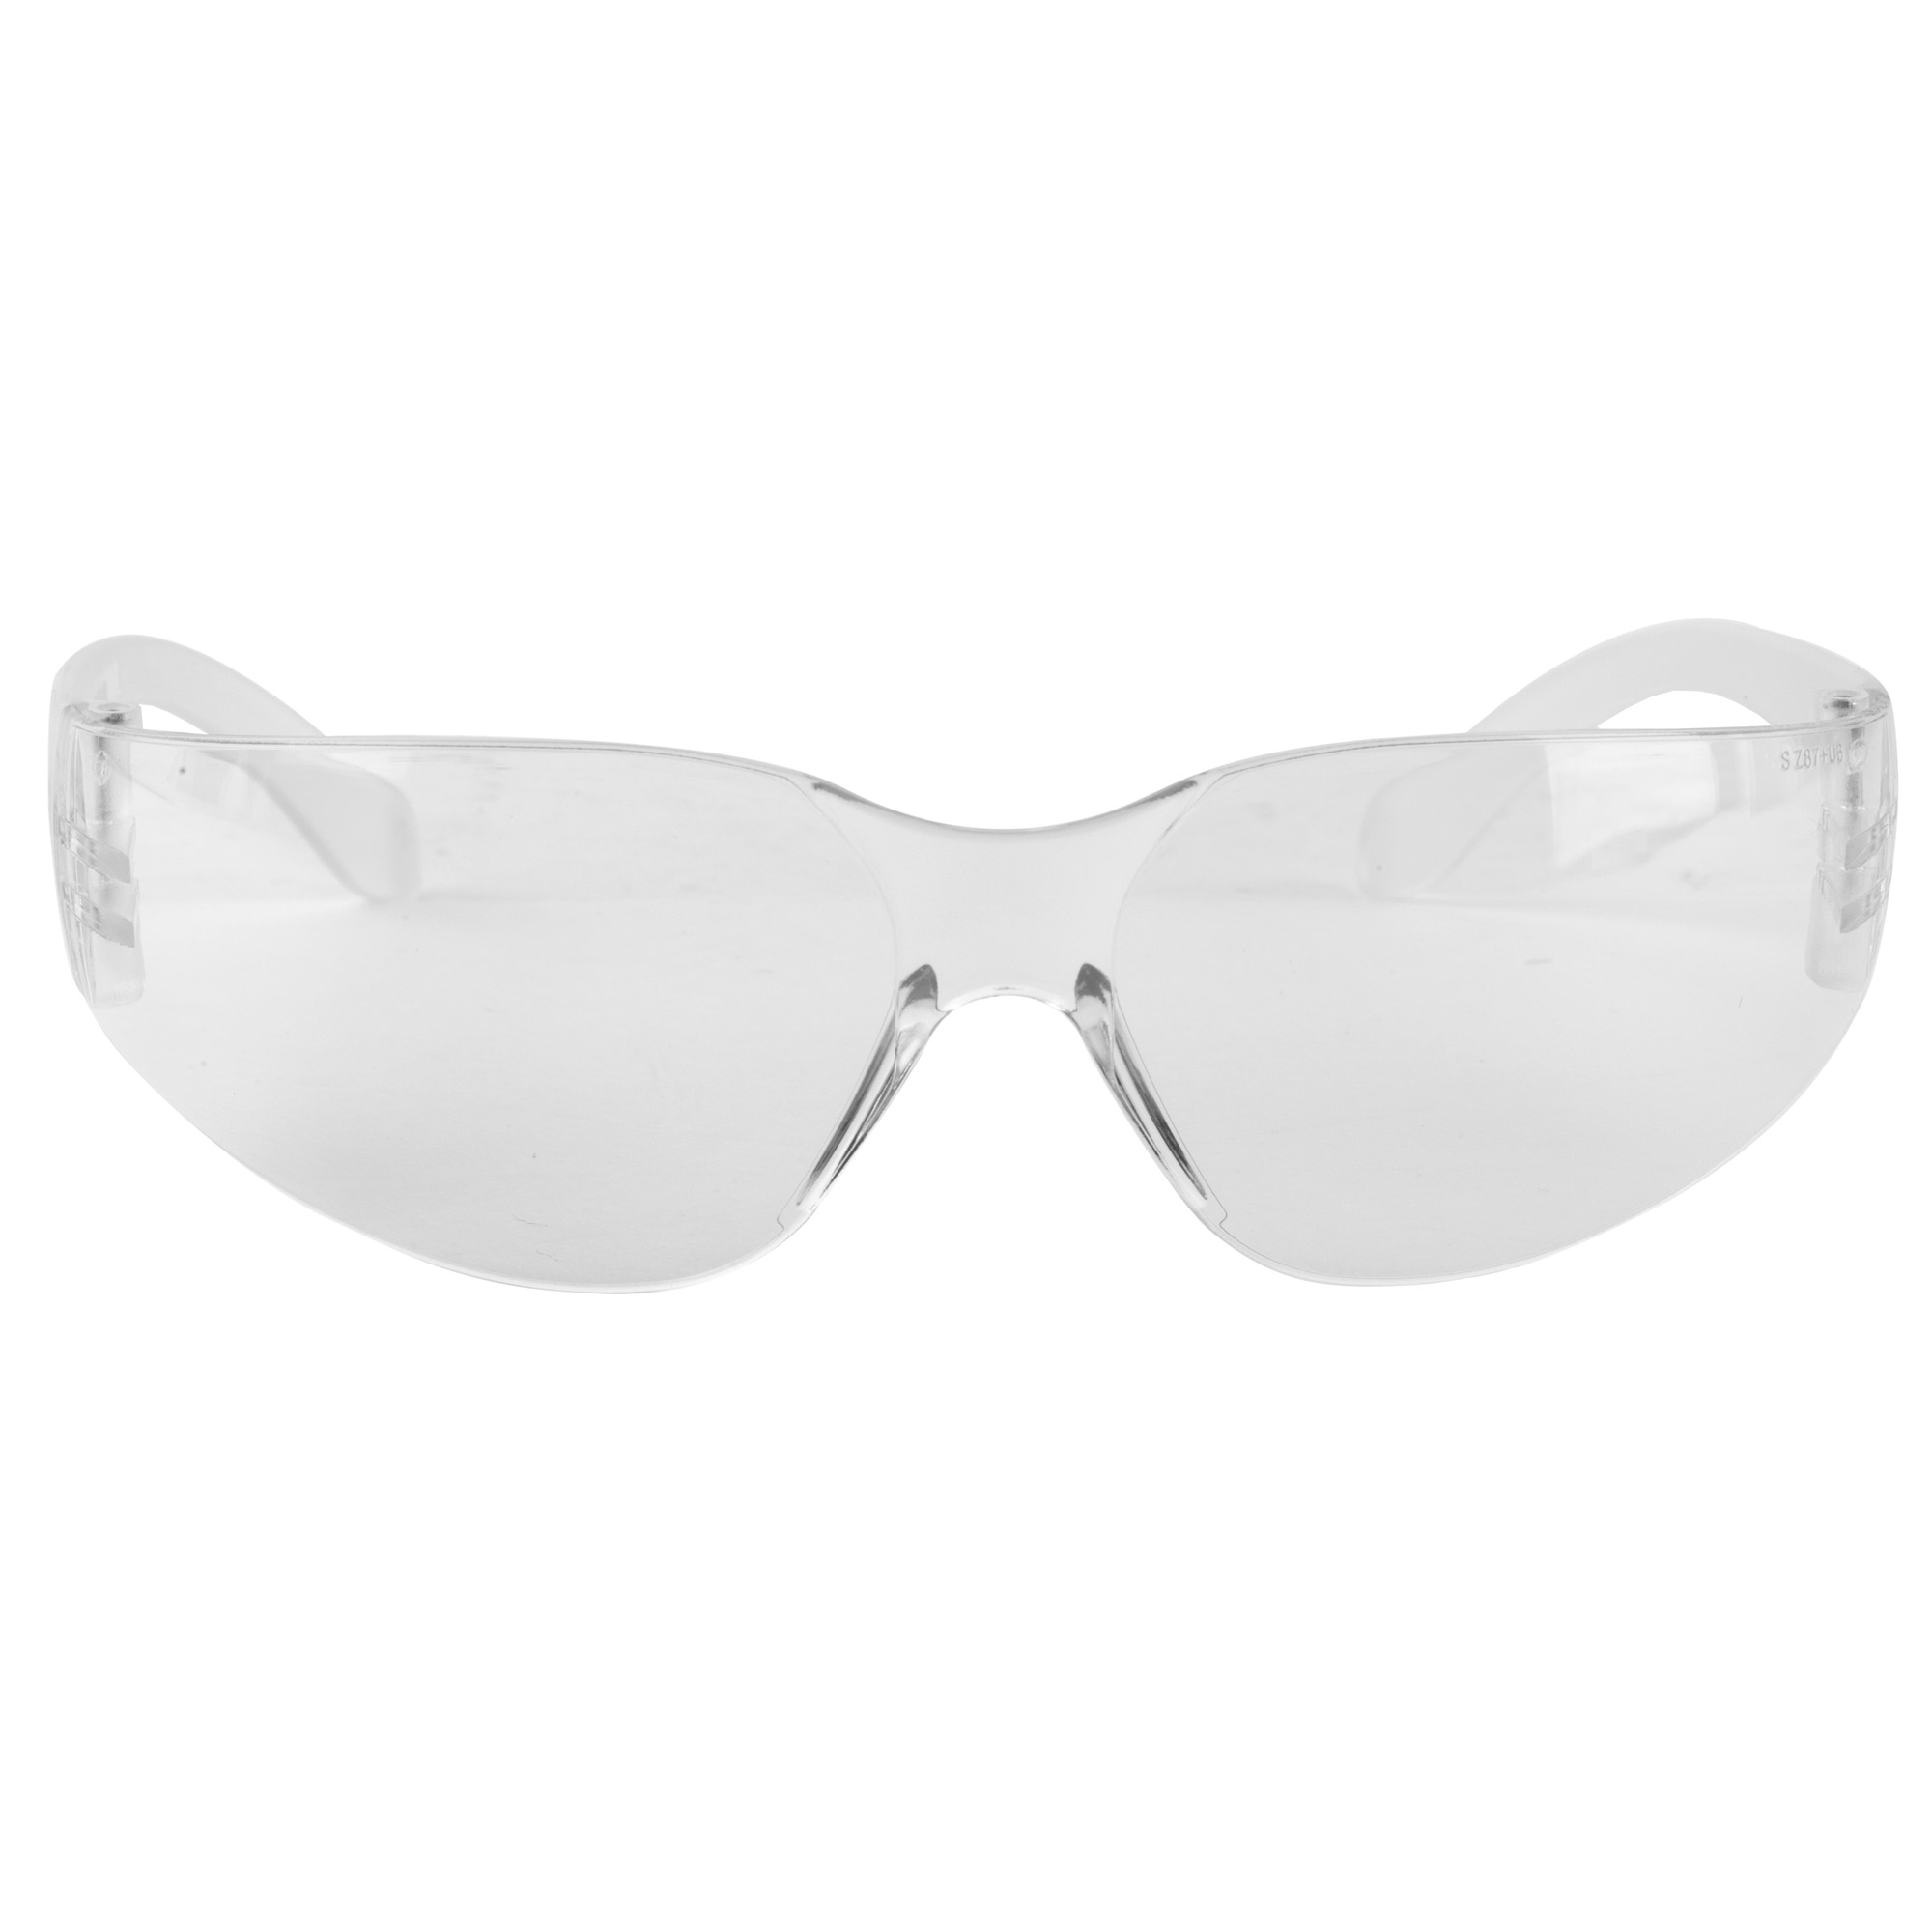 Walkers Wrap Sprt Glasses Clr